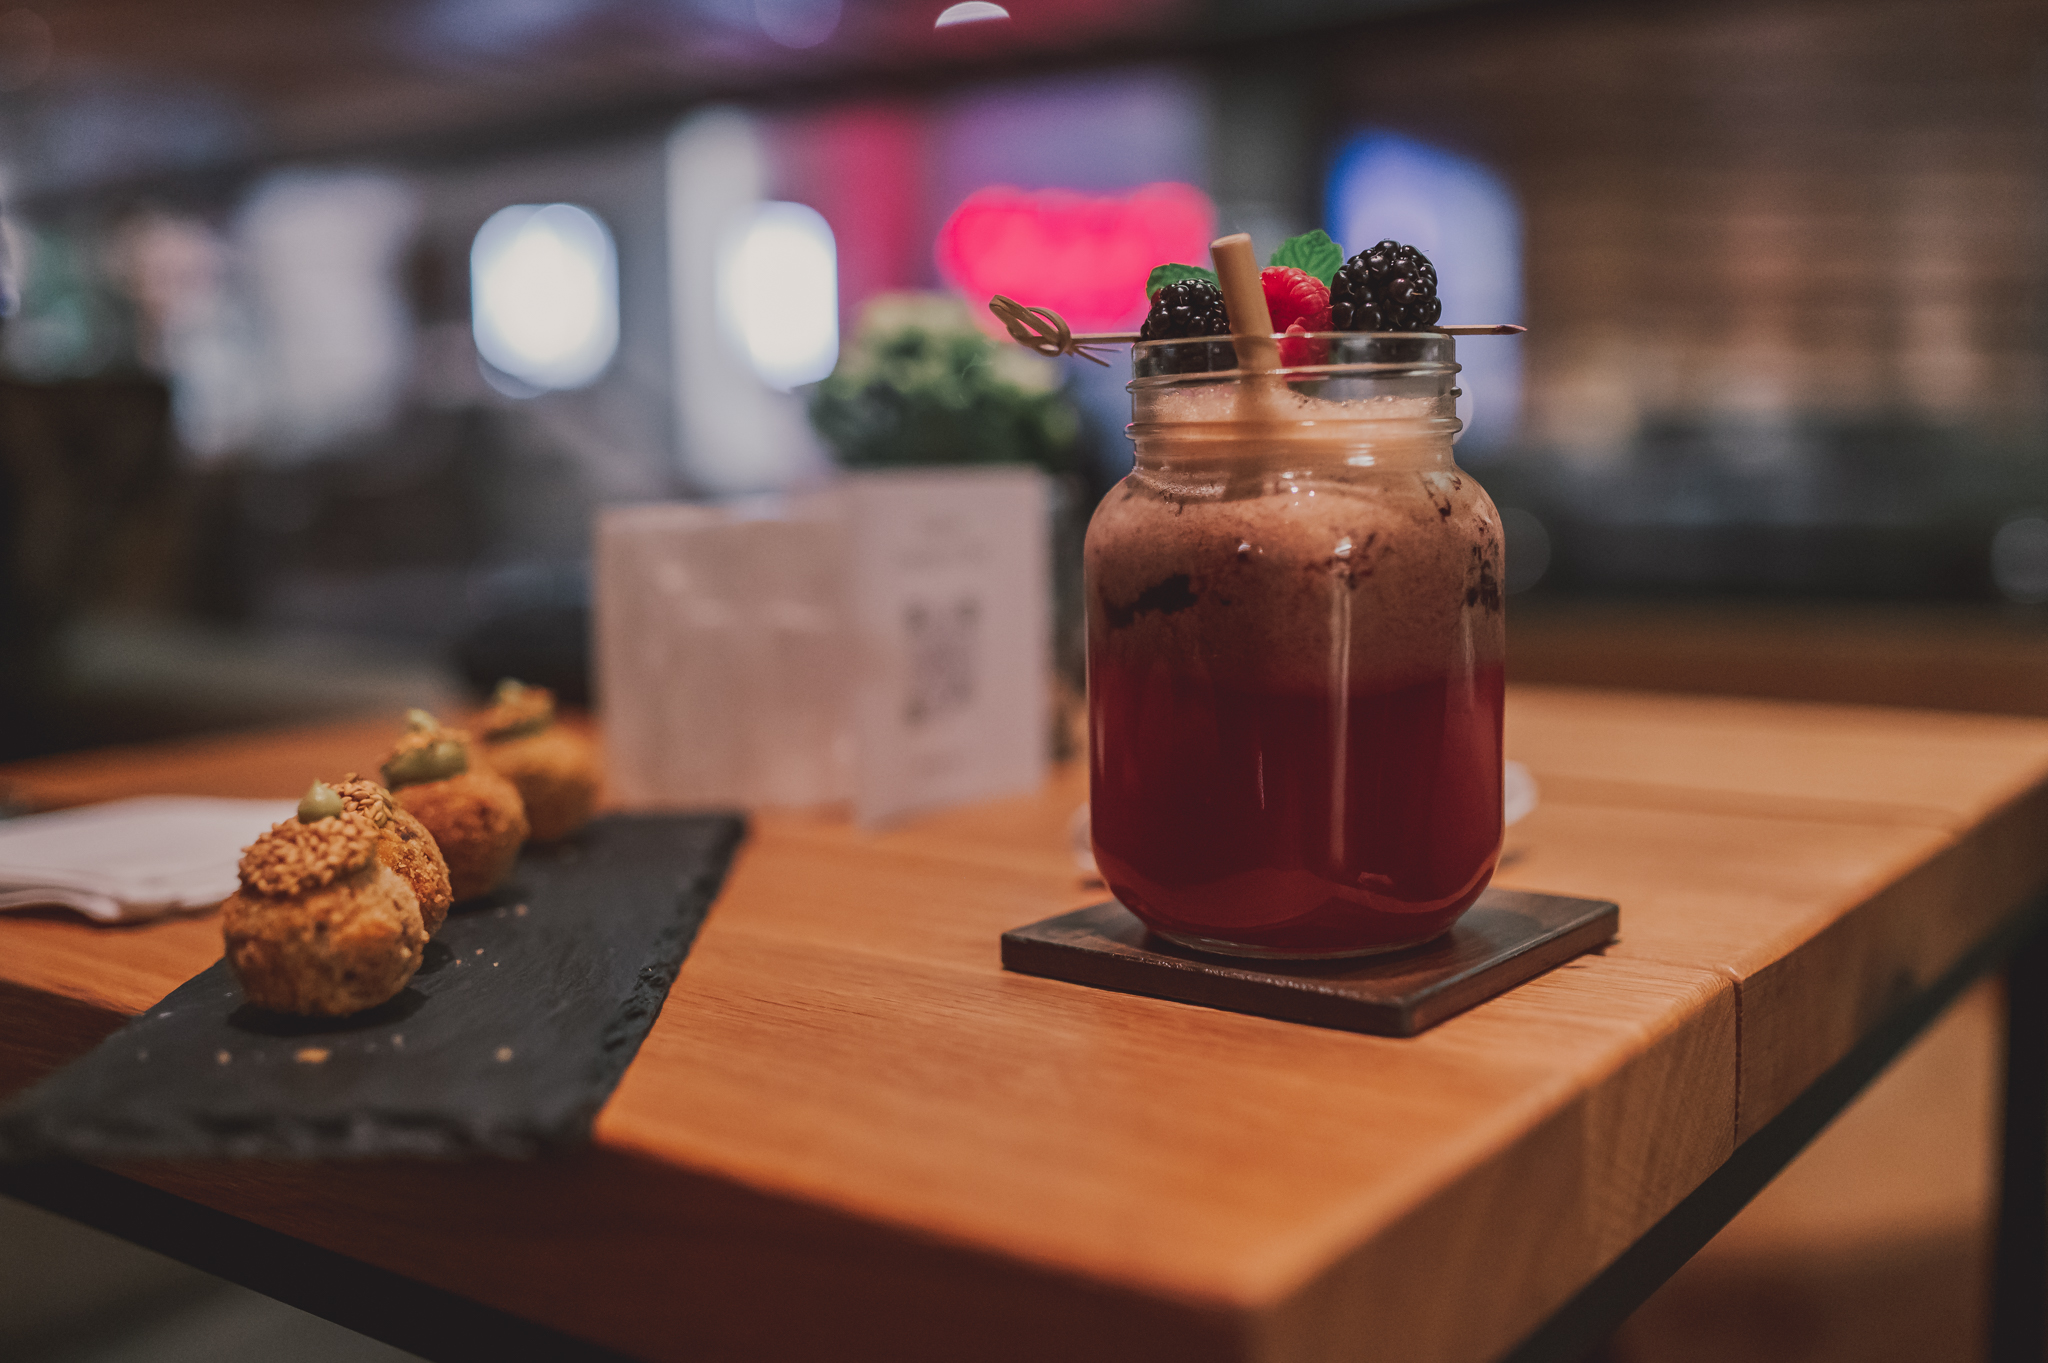 The Alpina Gstaad Bar Mocktail